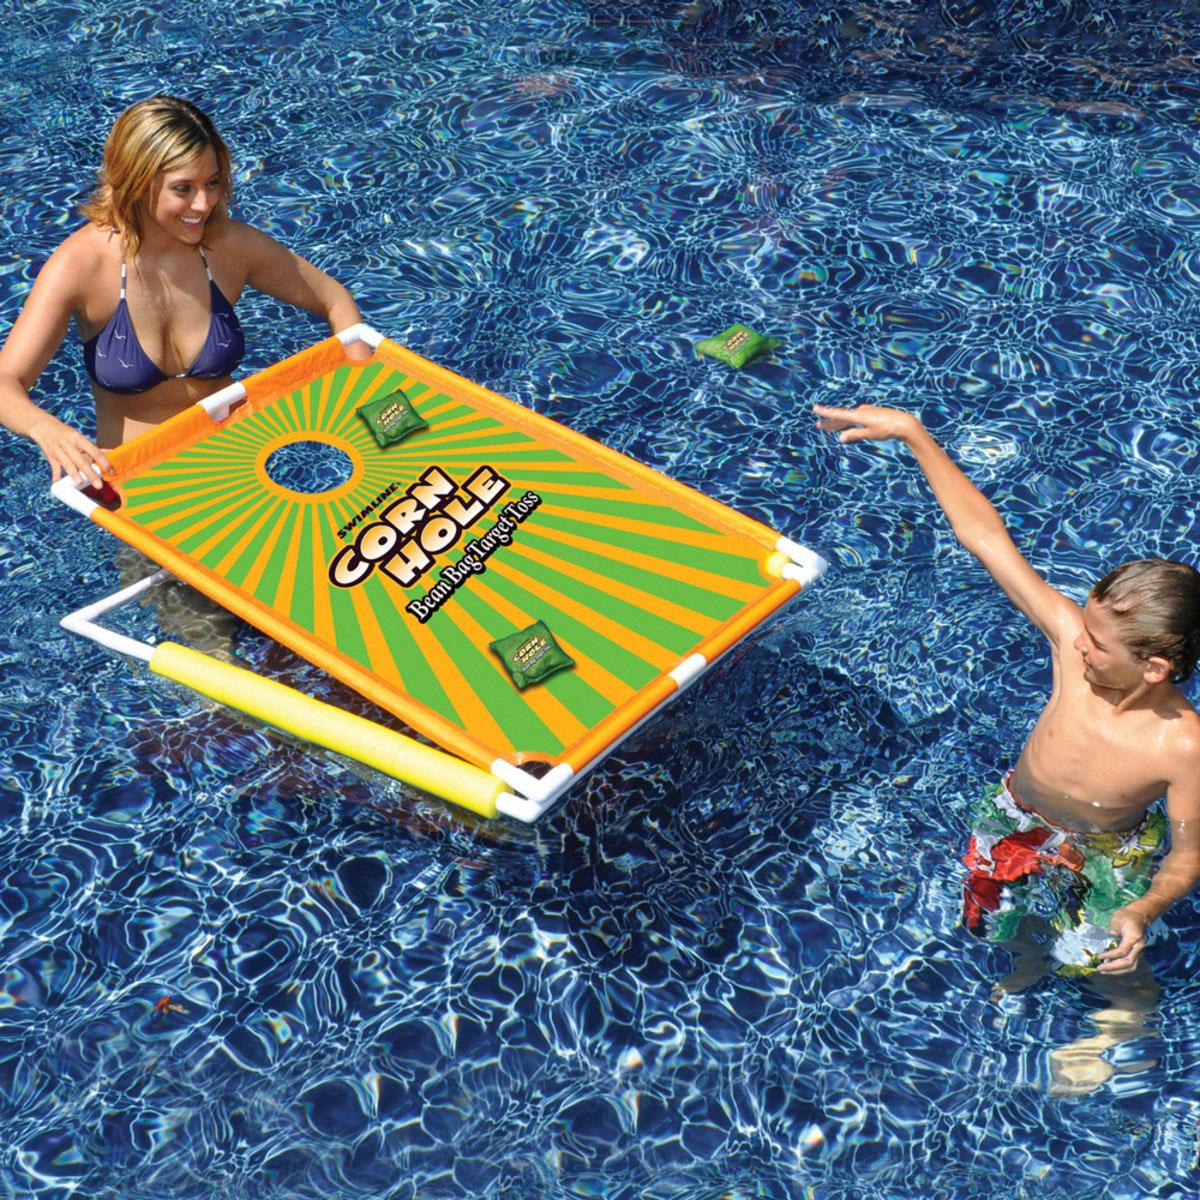 Swimline Corn Hole Bean Bag Target Toss Swimming Pool Game